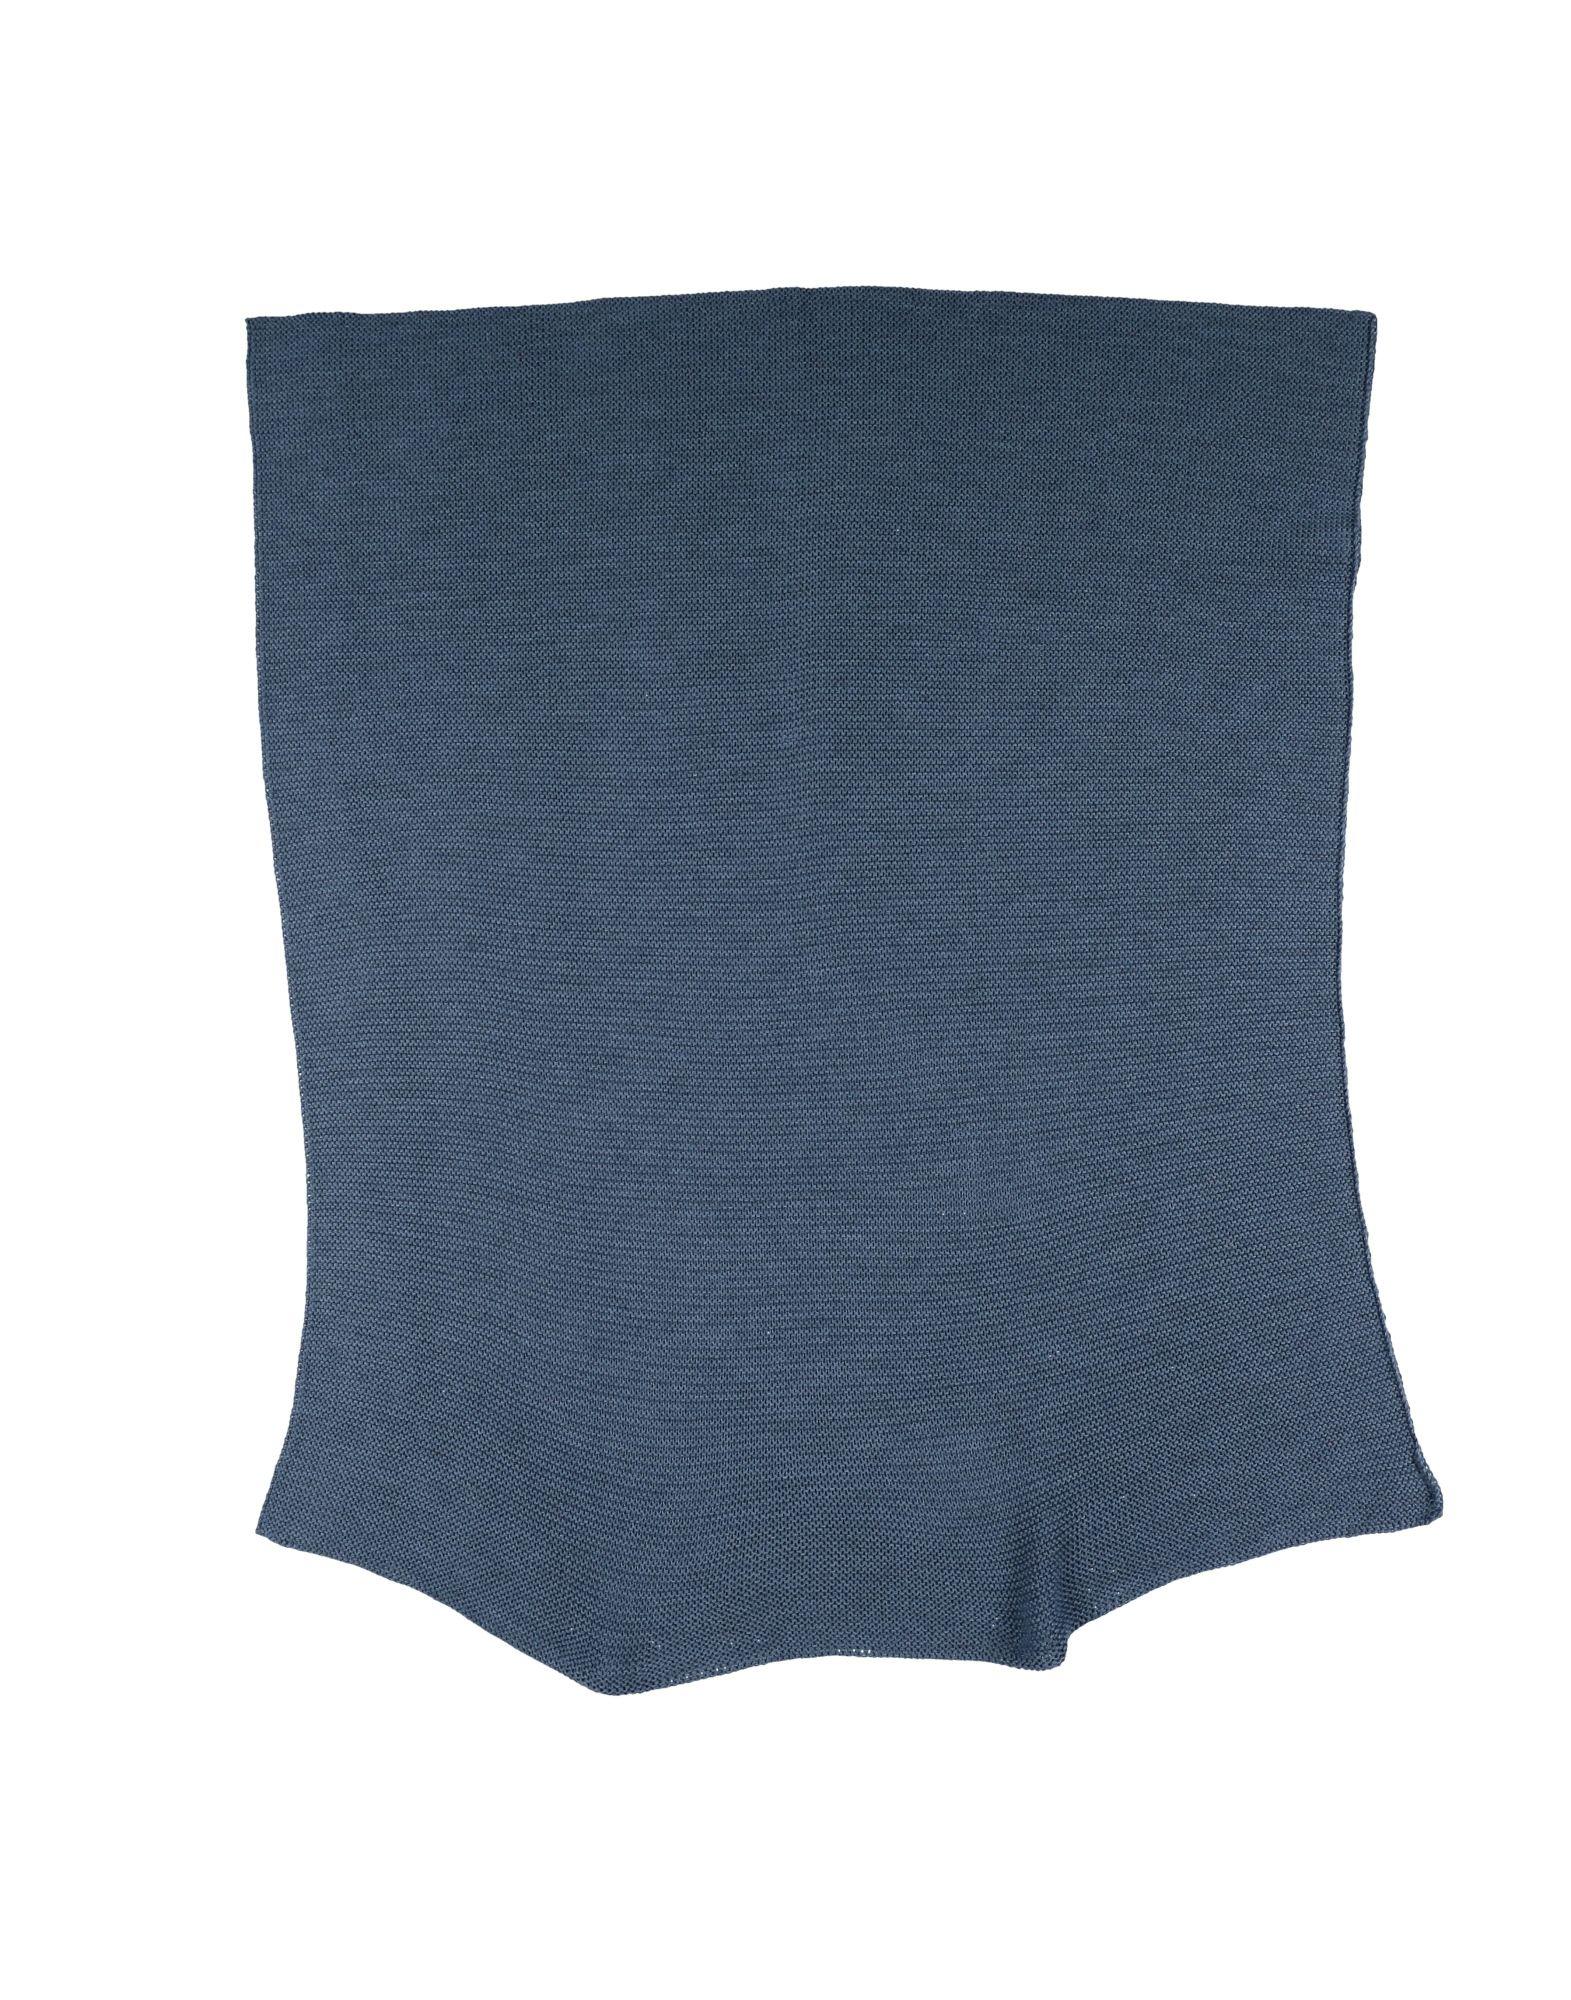 FILOBIO Одеяльце для младенцев filobio одеяльце для младенцев